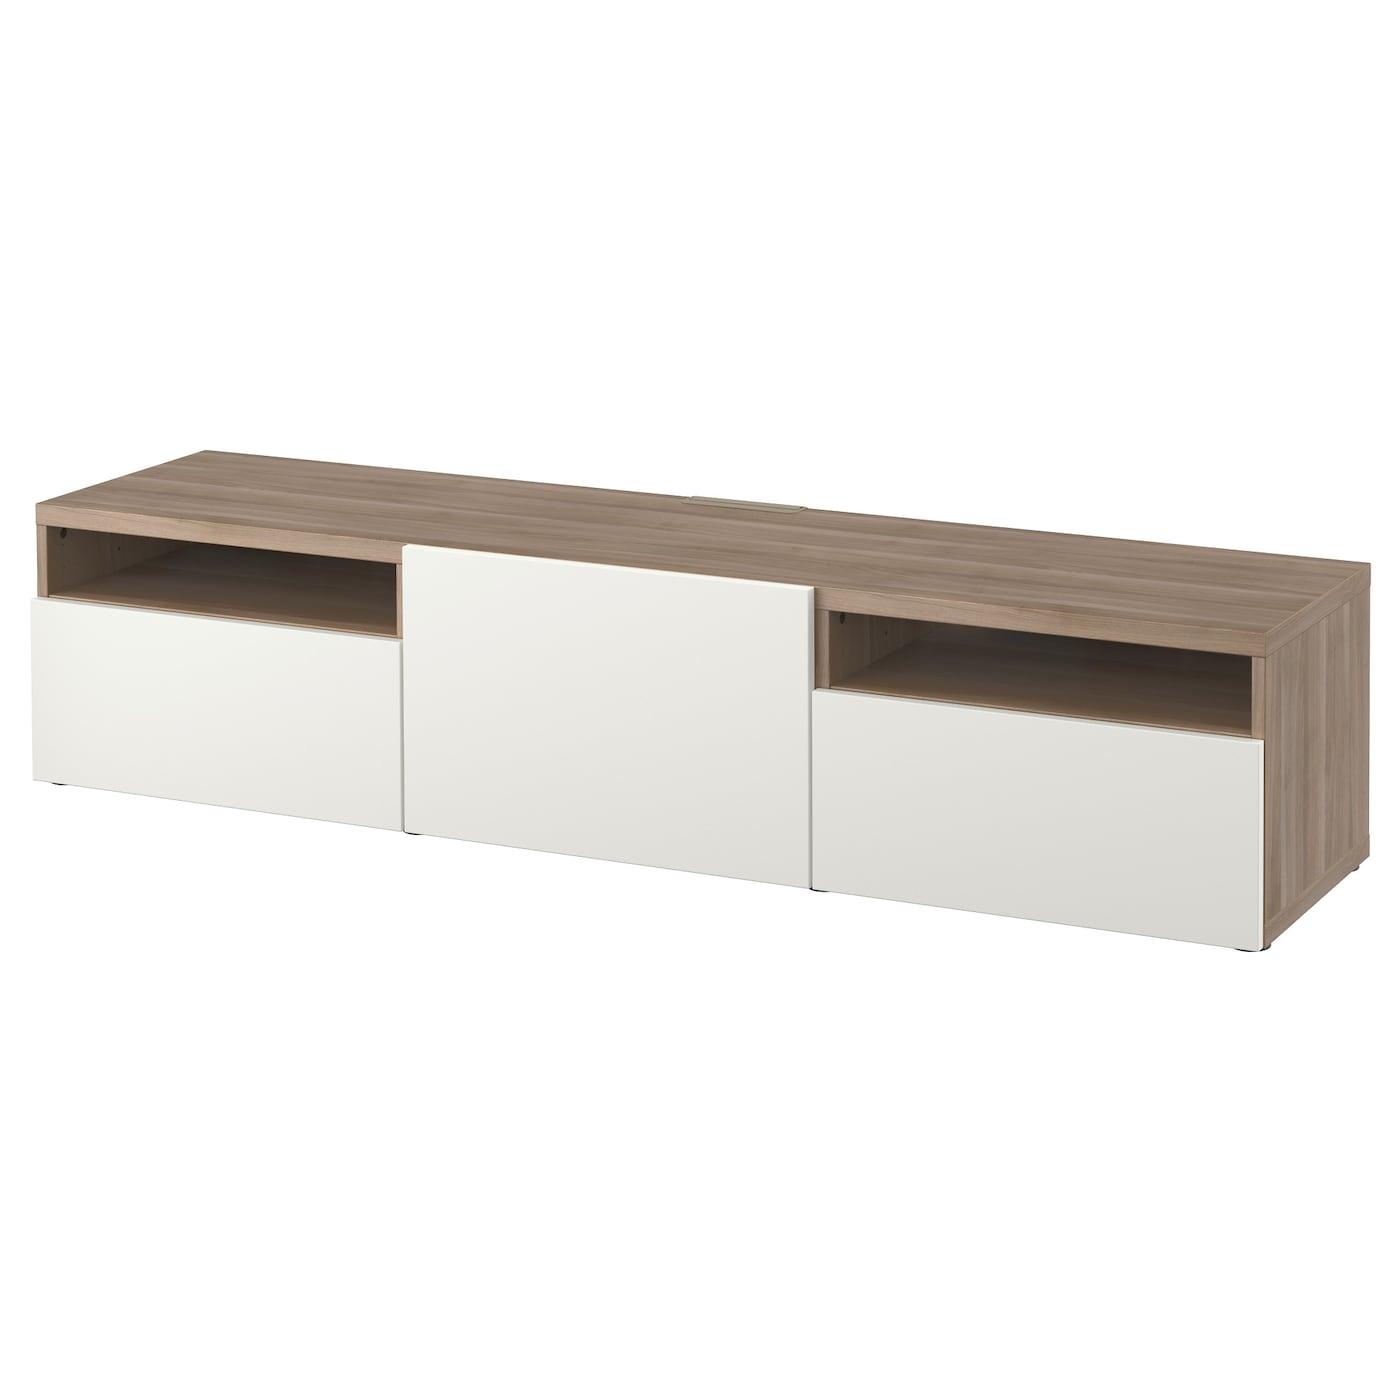 Best Banc Tv Motif Noyer Teint Gris Lappviken Blanc 180x40x38 Cm  # Banc Tv Ikea Besta Noyer Teinte Gris